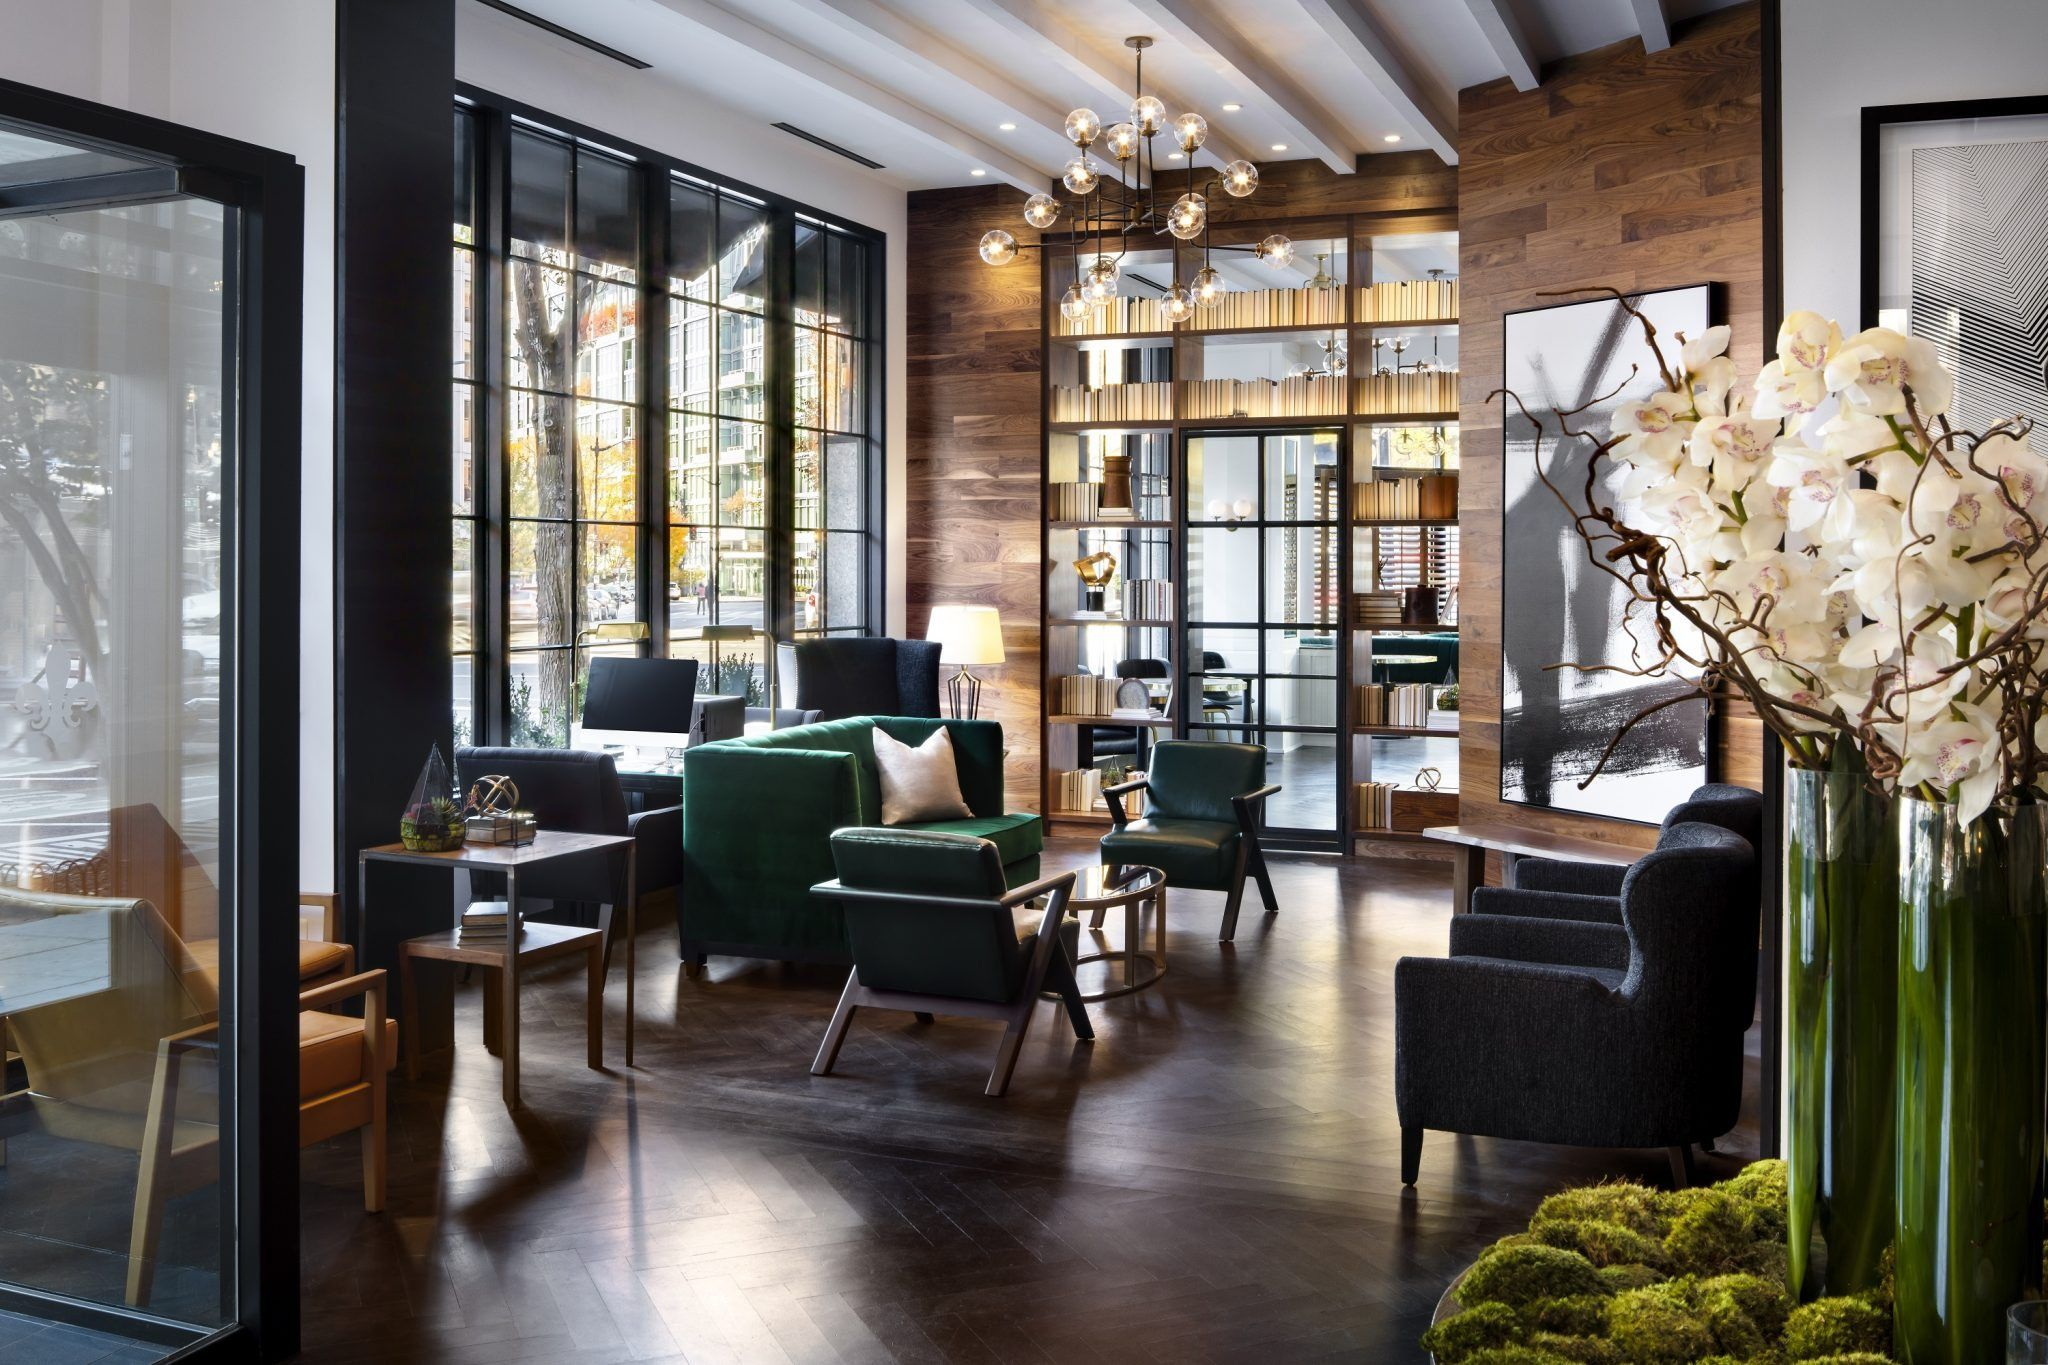 Washington Dc Hotel Photos Video In 2020 Hotel Lobby Design Luxury Rooms Trending Decor